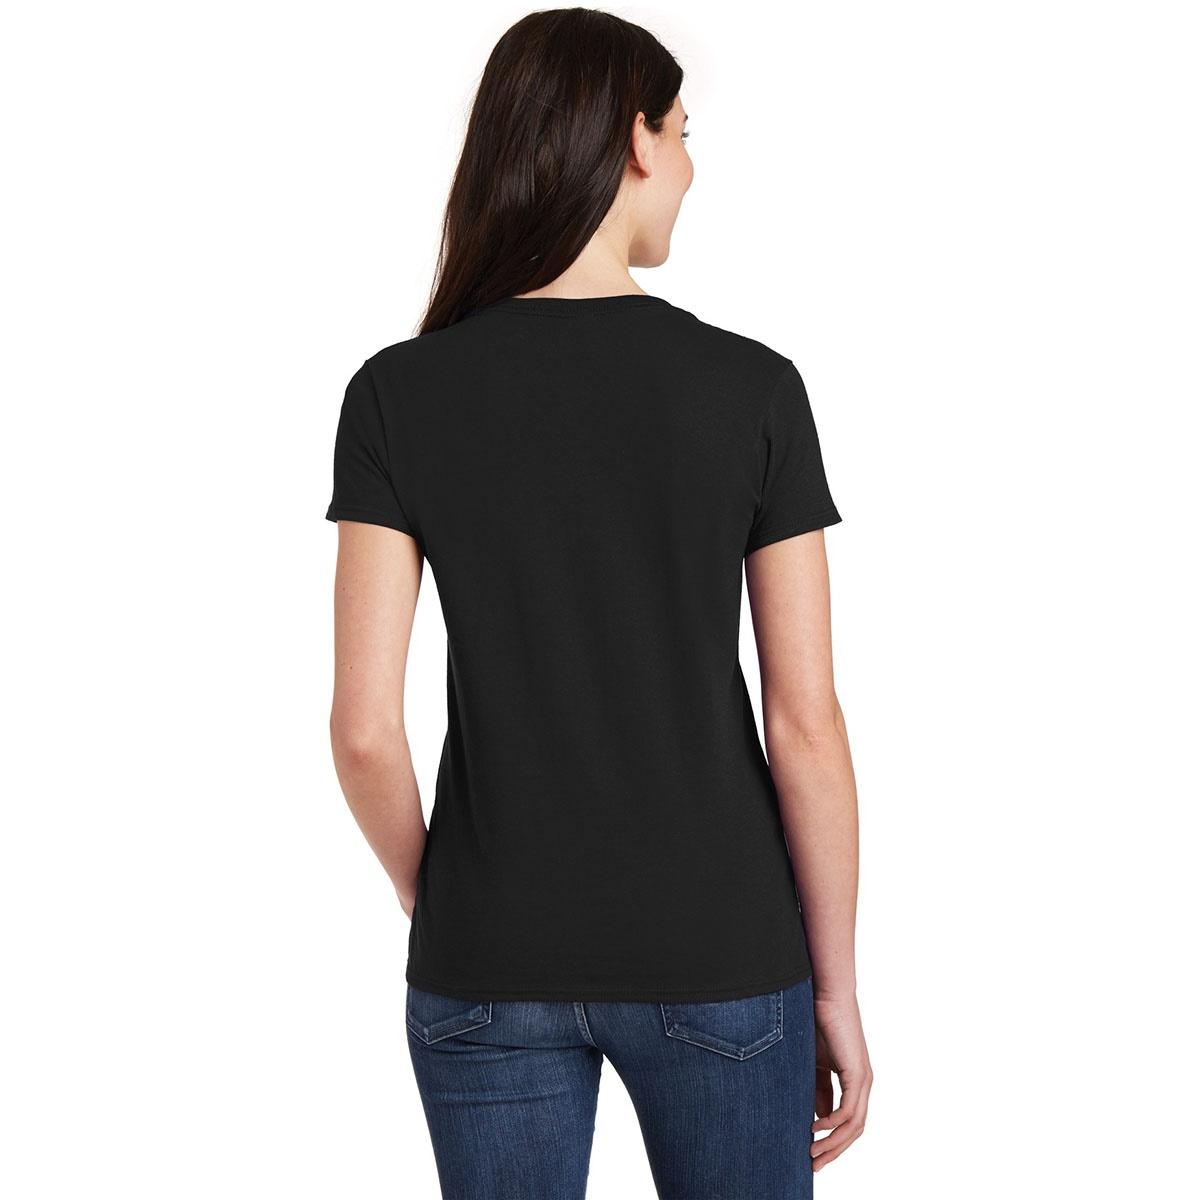 Gildan 5v00l ladies heavy cotton v neck t shirt black for V neck back shirt